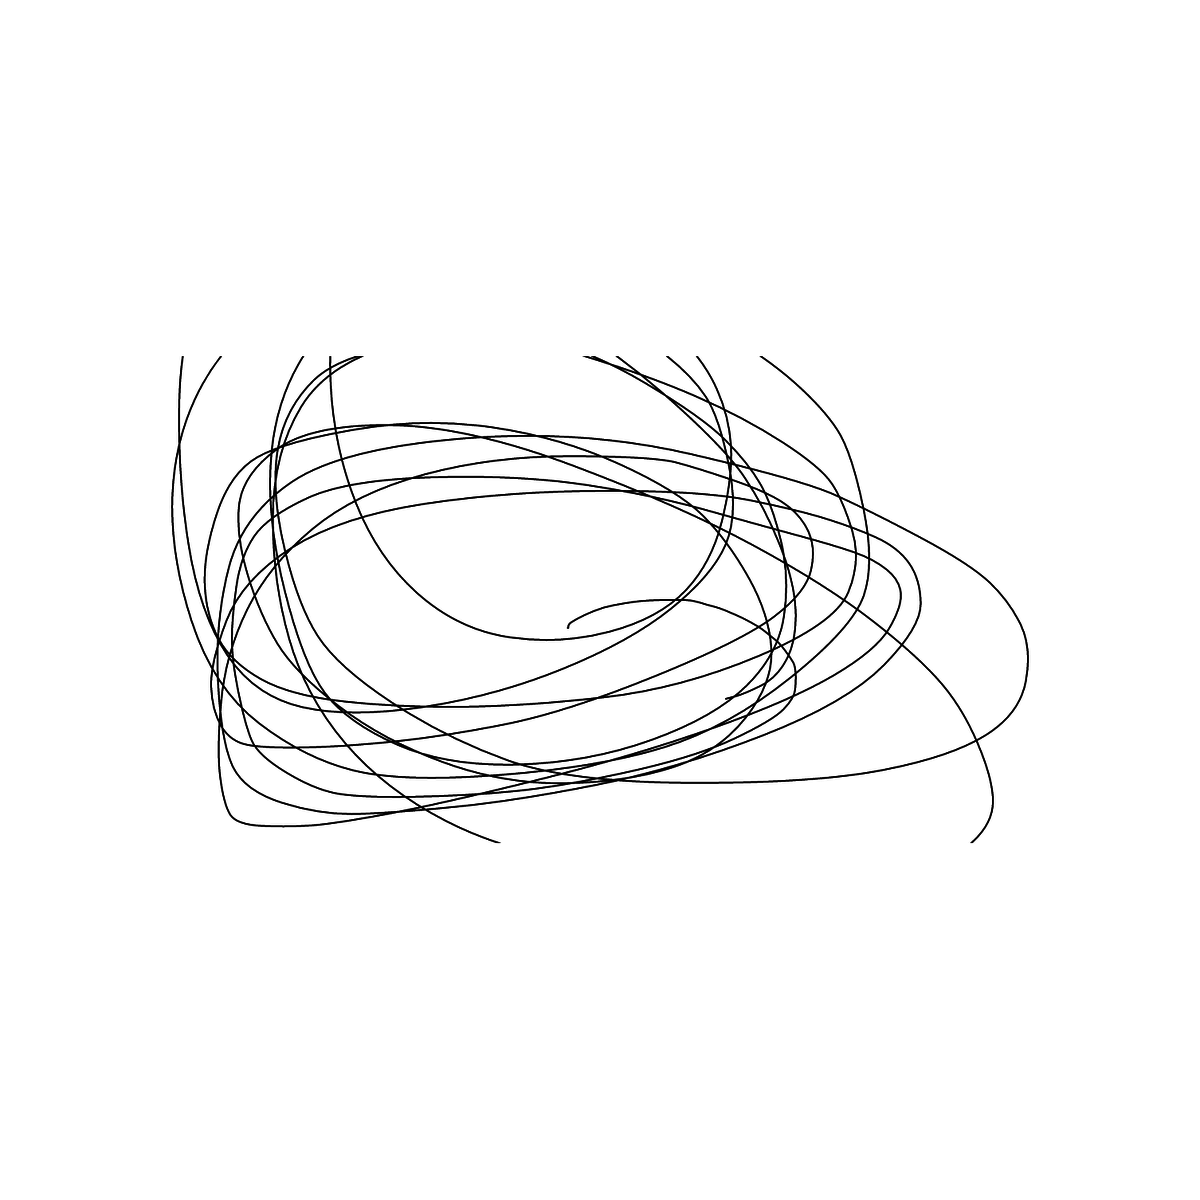 BAAAM drawing#2108 lat:49.6960601806640600lng: 3.9990019798278810